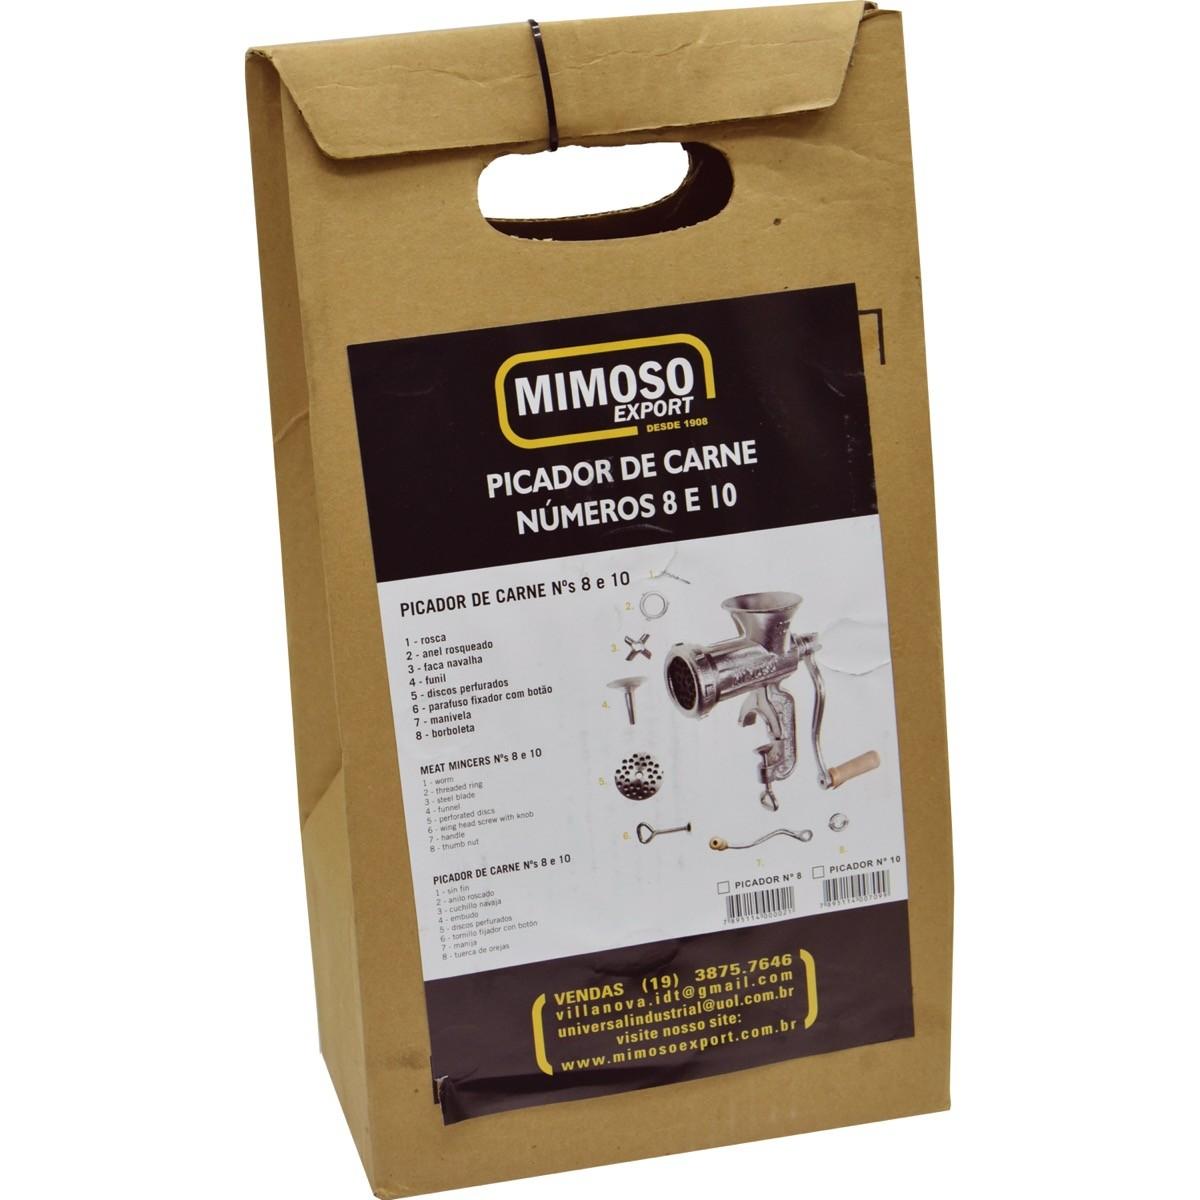 Moedor / Picador / Maquina de Moer Carne N10 Ferro Fundido Mimoso Original